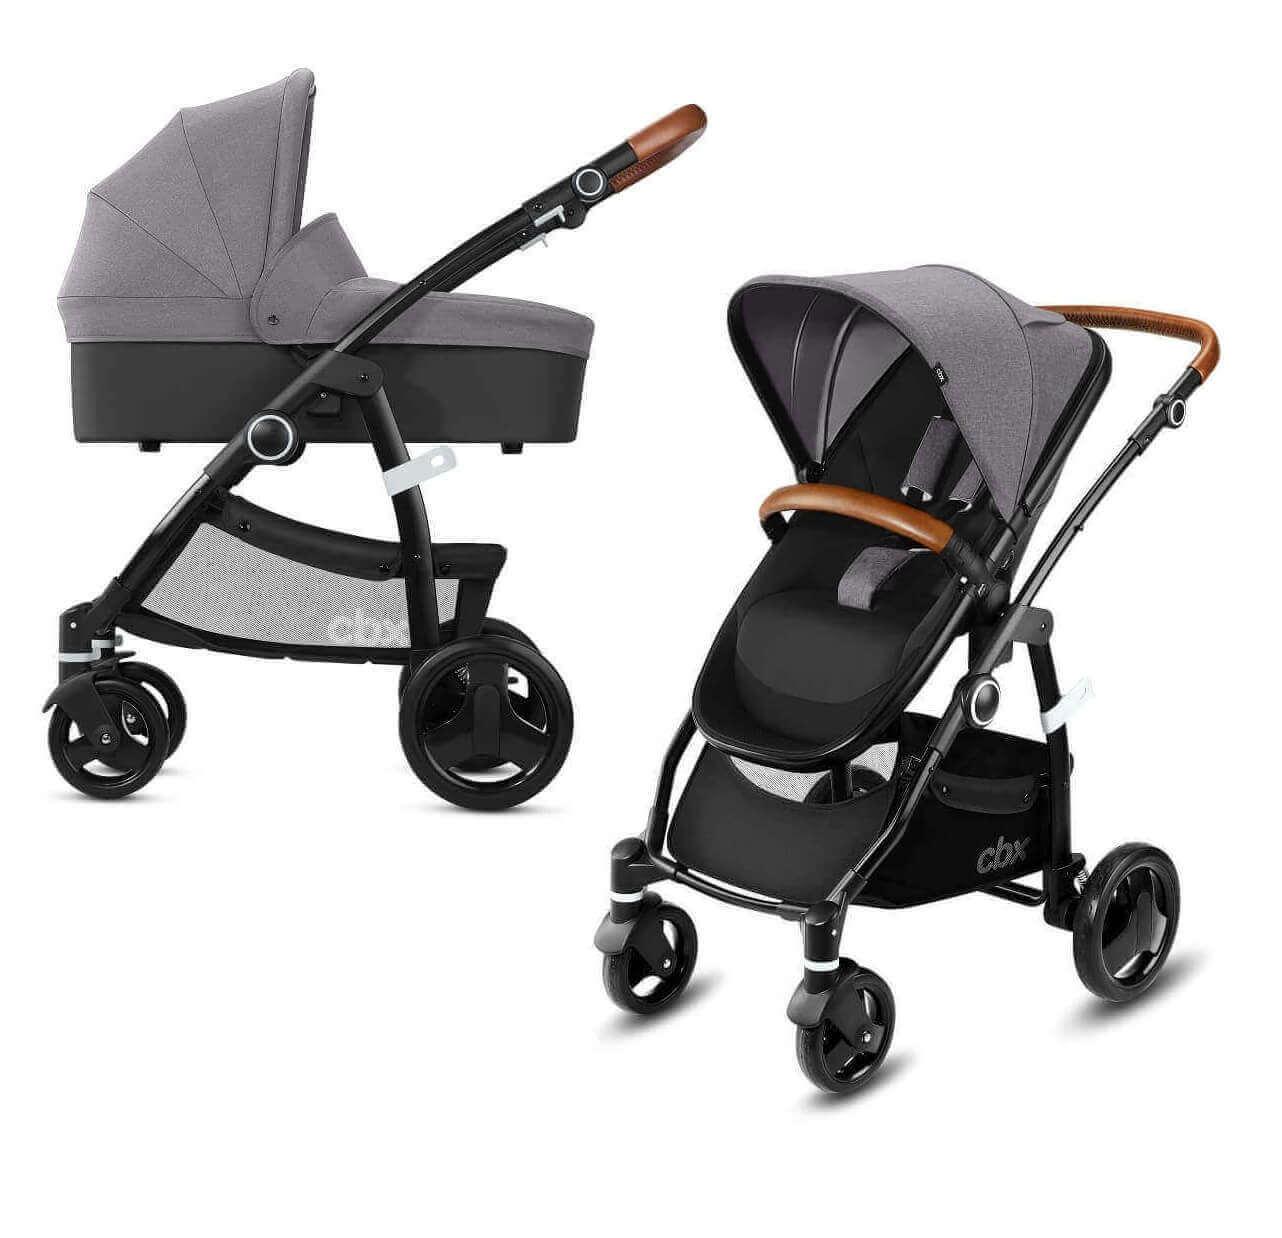 CBX by Cybex Leotie Lux 2 в 1 Детская коляска 2 в 1 CBX by Cybex Leotie Lux Comfy Grey CBX_18_090_LEOTIE_LUX_GREY_WITHCARRYCOT_0748_DERV_HQ_-_копия.jpg